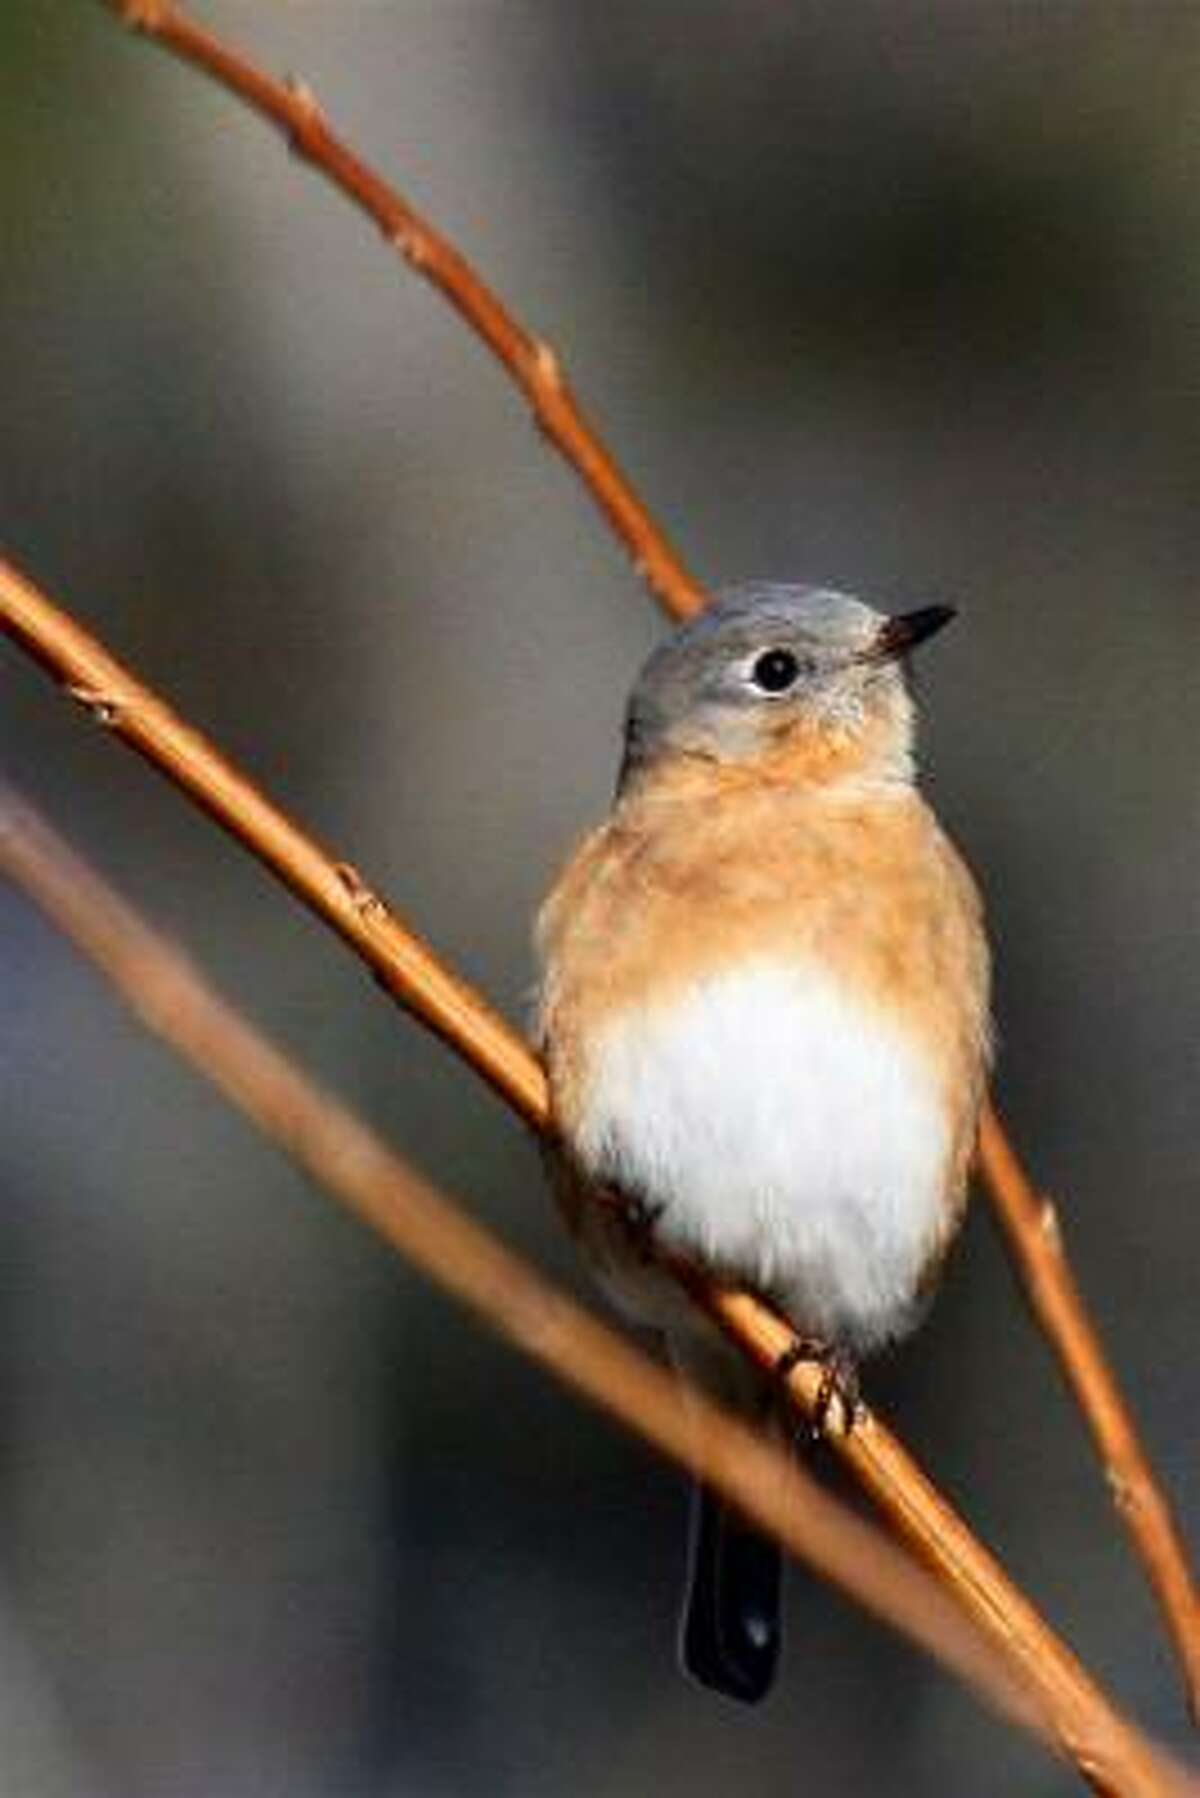 Female eastern bluebird Submit your garden photos | Houston Plant Database | HoustonGrows.com